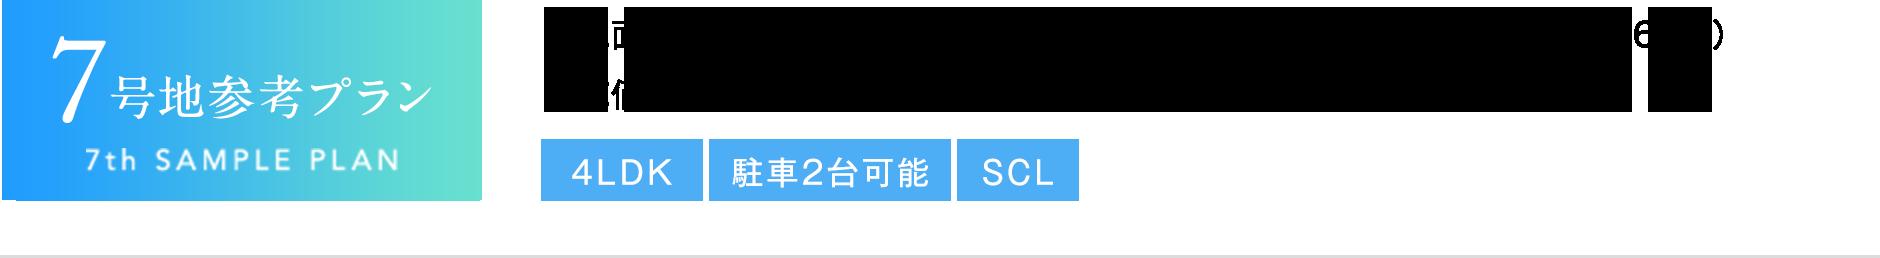 7号地参考プラン 4LDK 駐車2台可能 SCL WCL